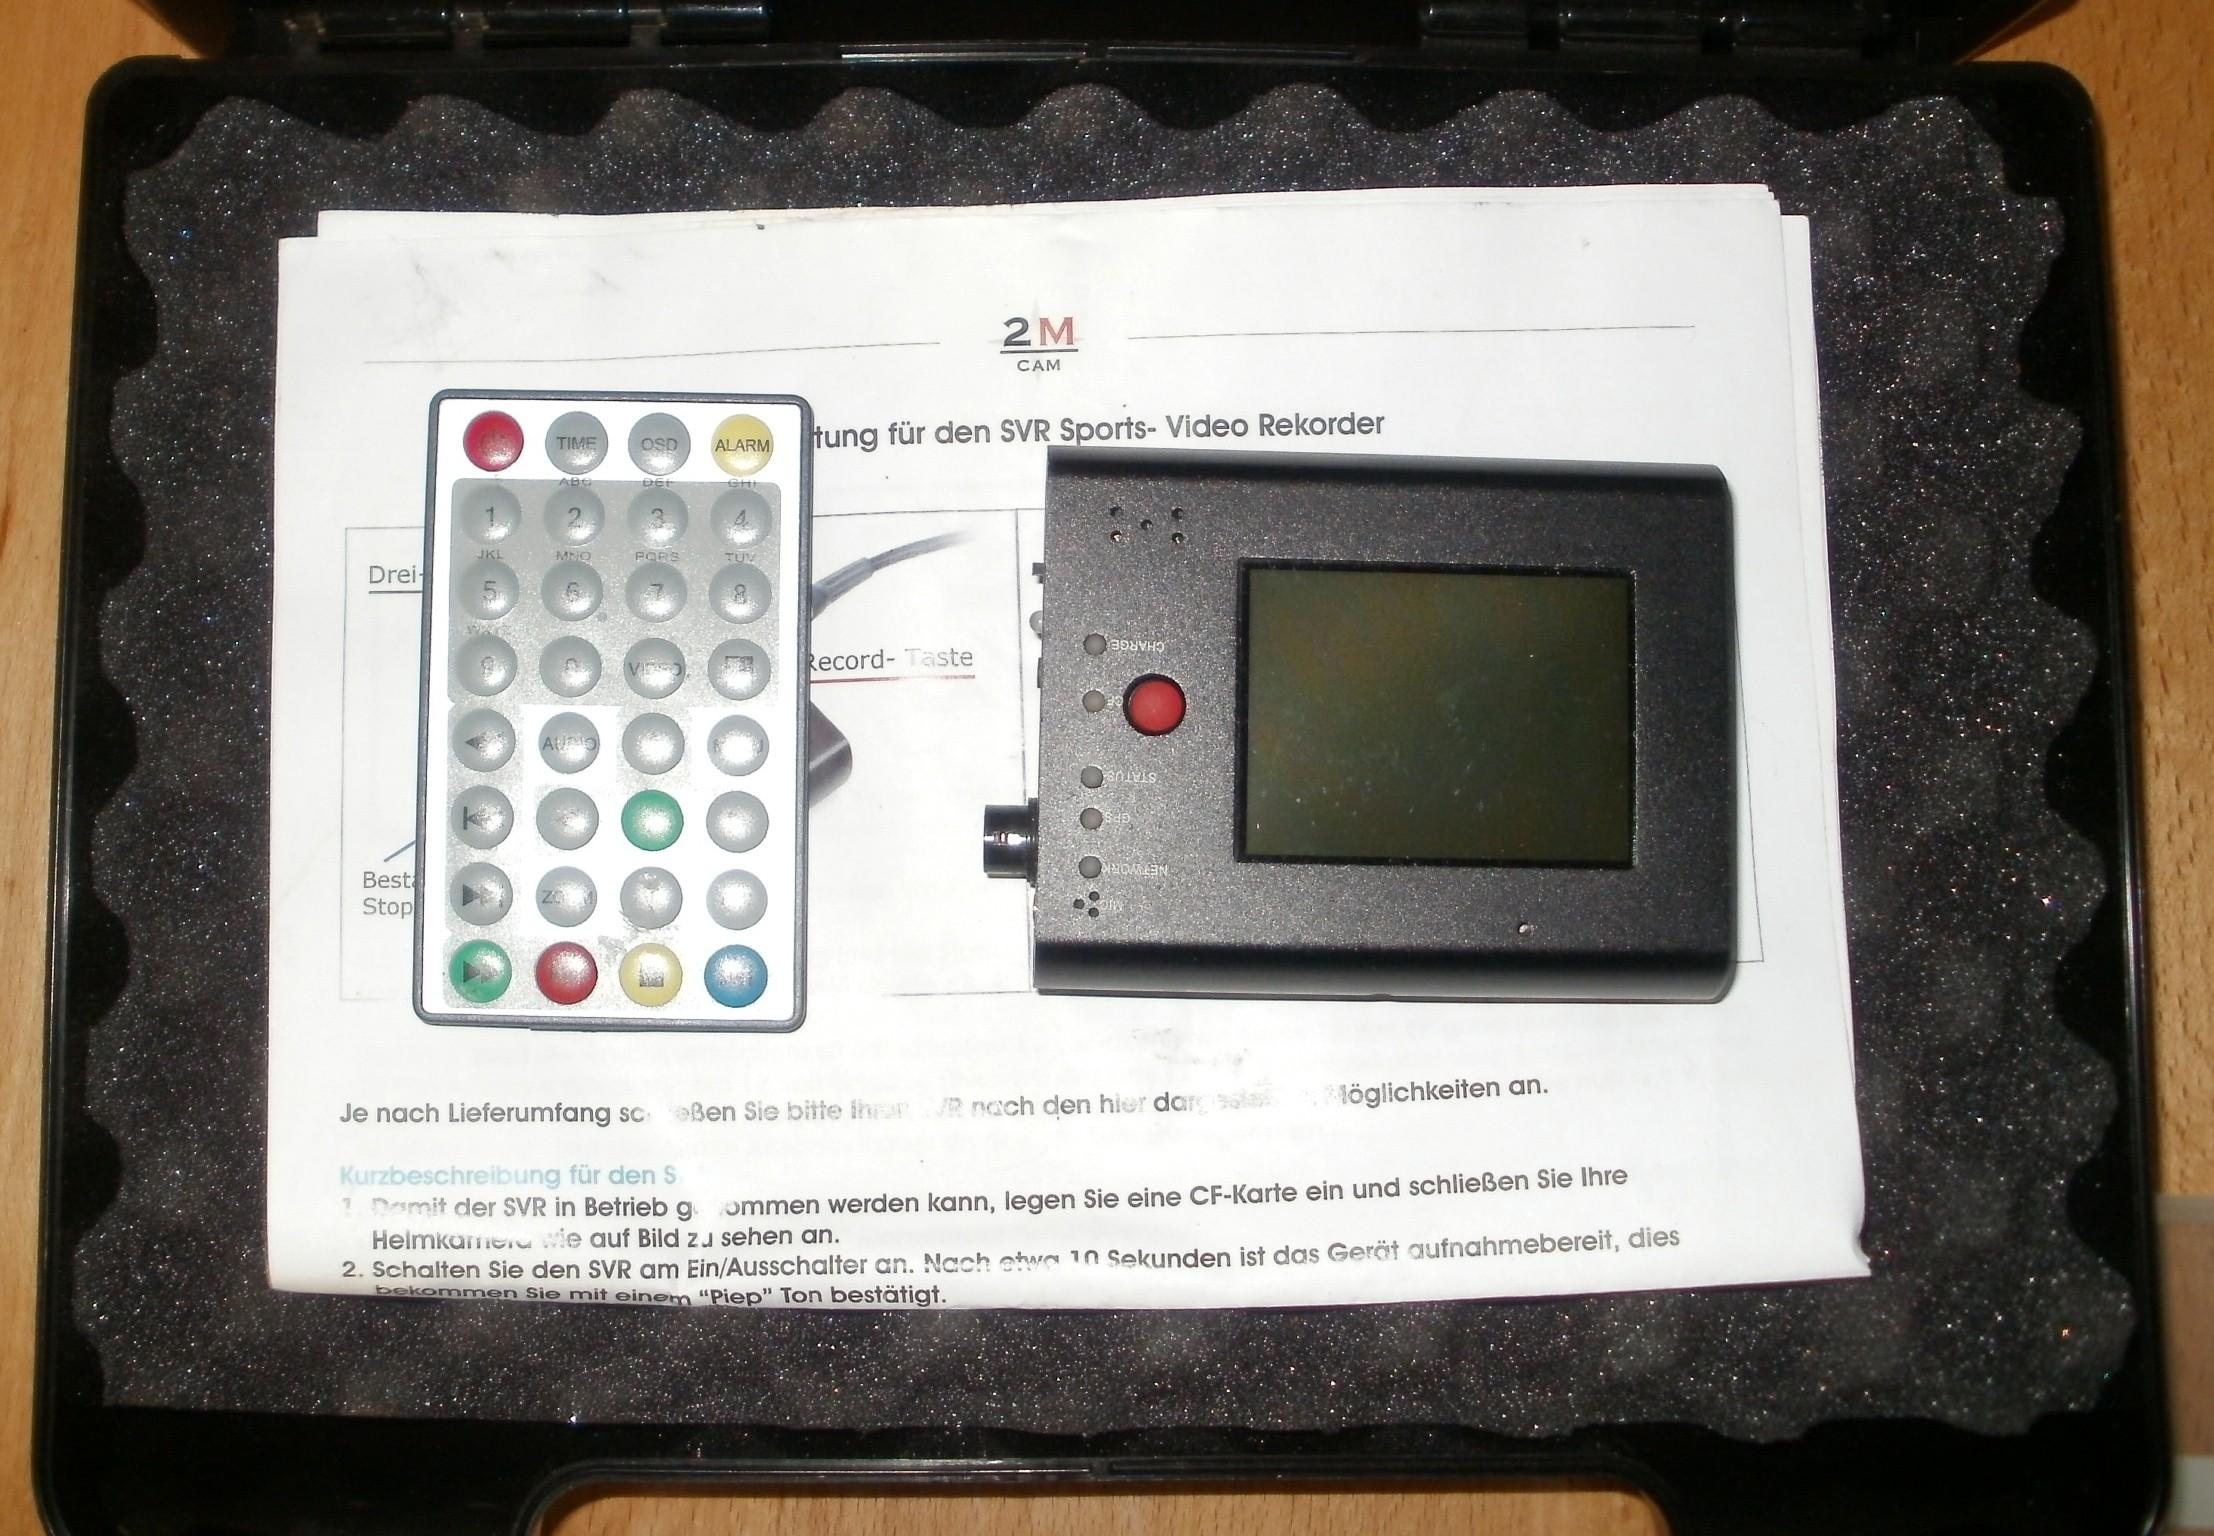 2M-CAM 59 SHQ mit SVR3 Recorder